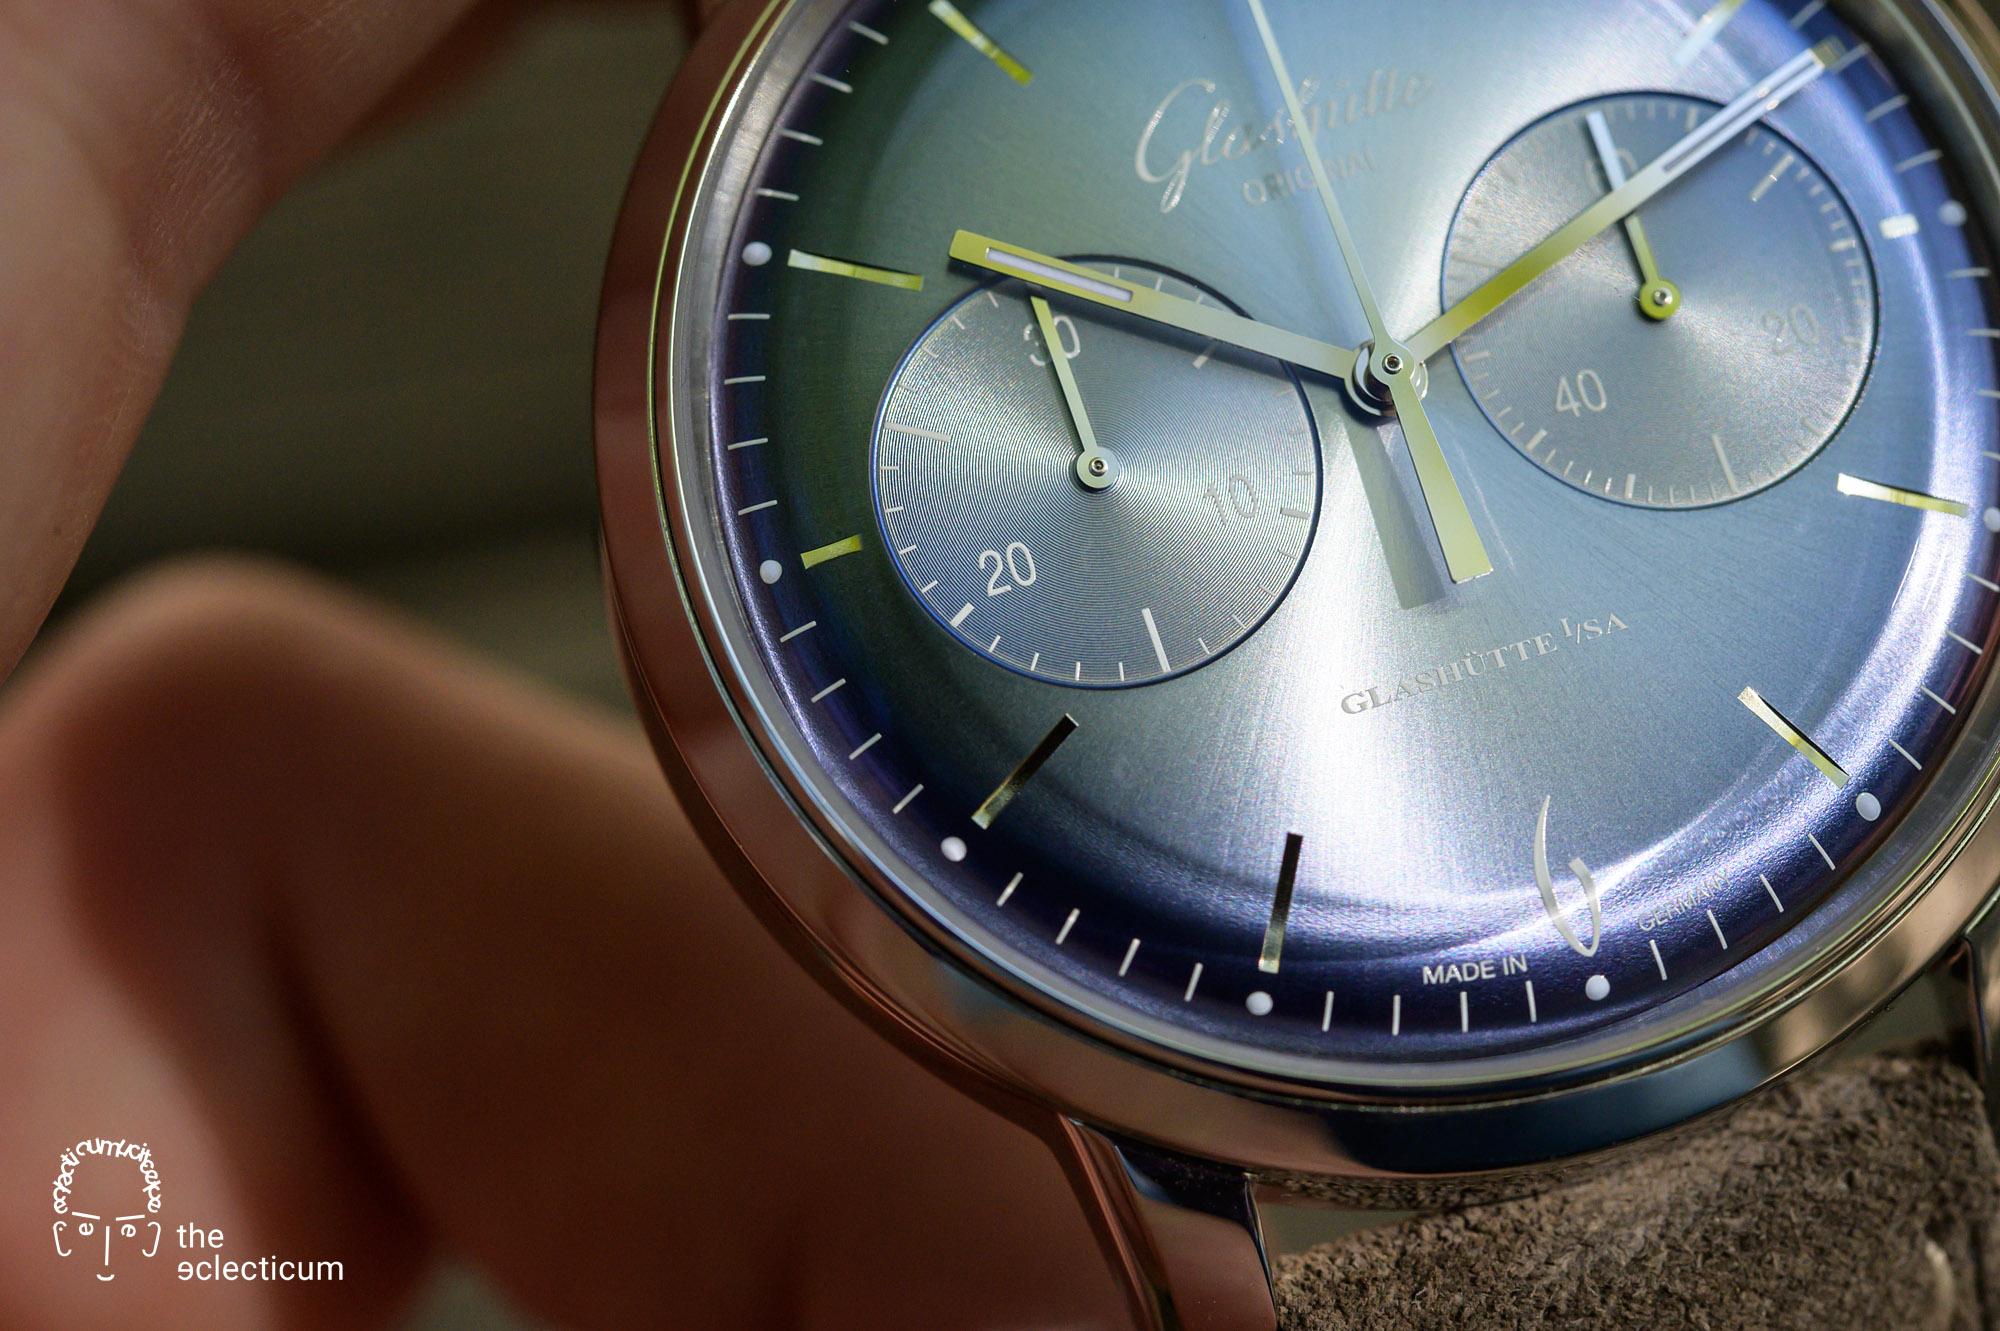 Glashütte Original Sixties Annual Edition 2020 Glacier Blue Chronograph dial